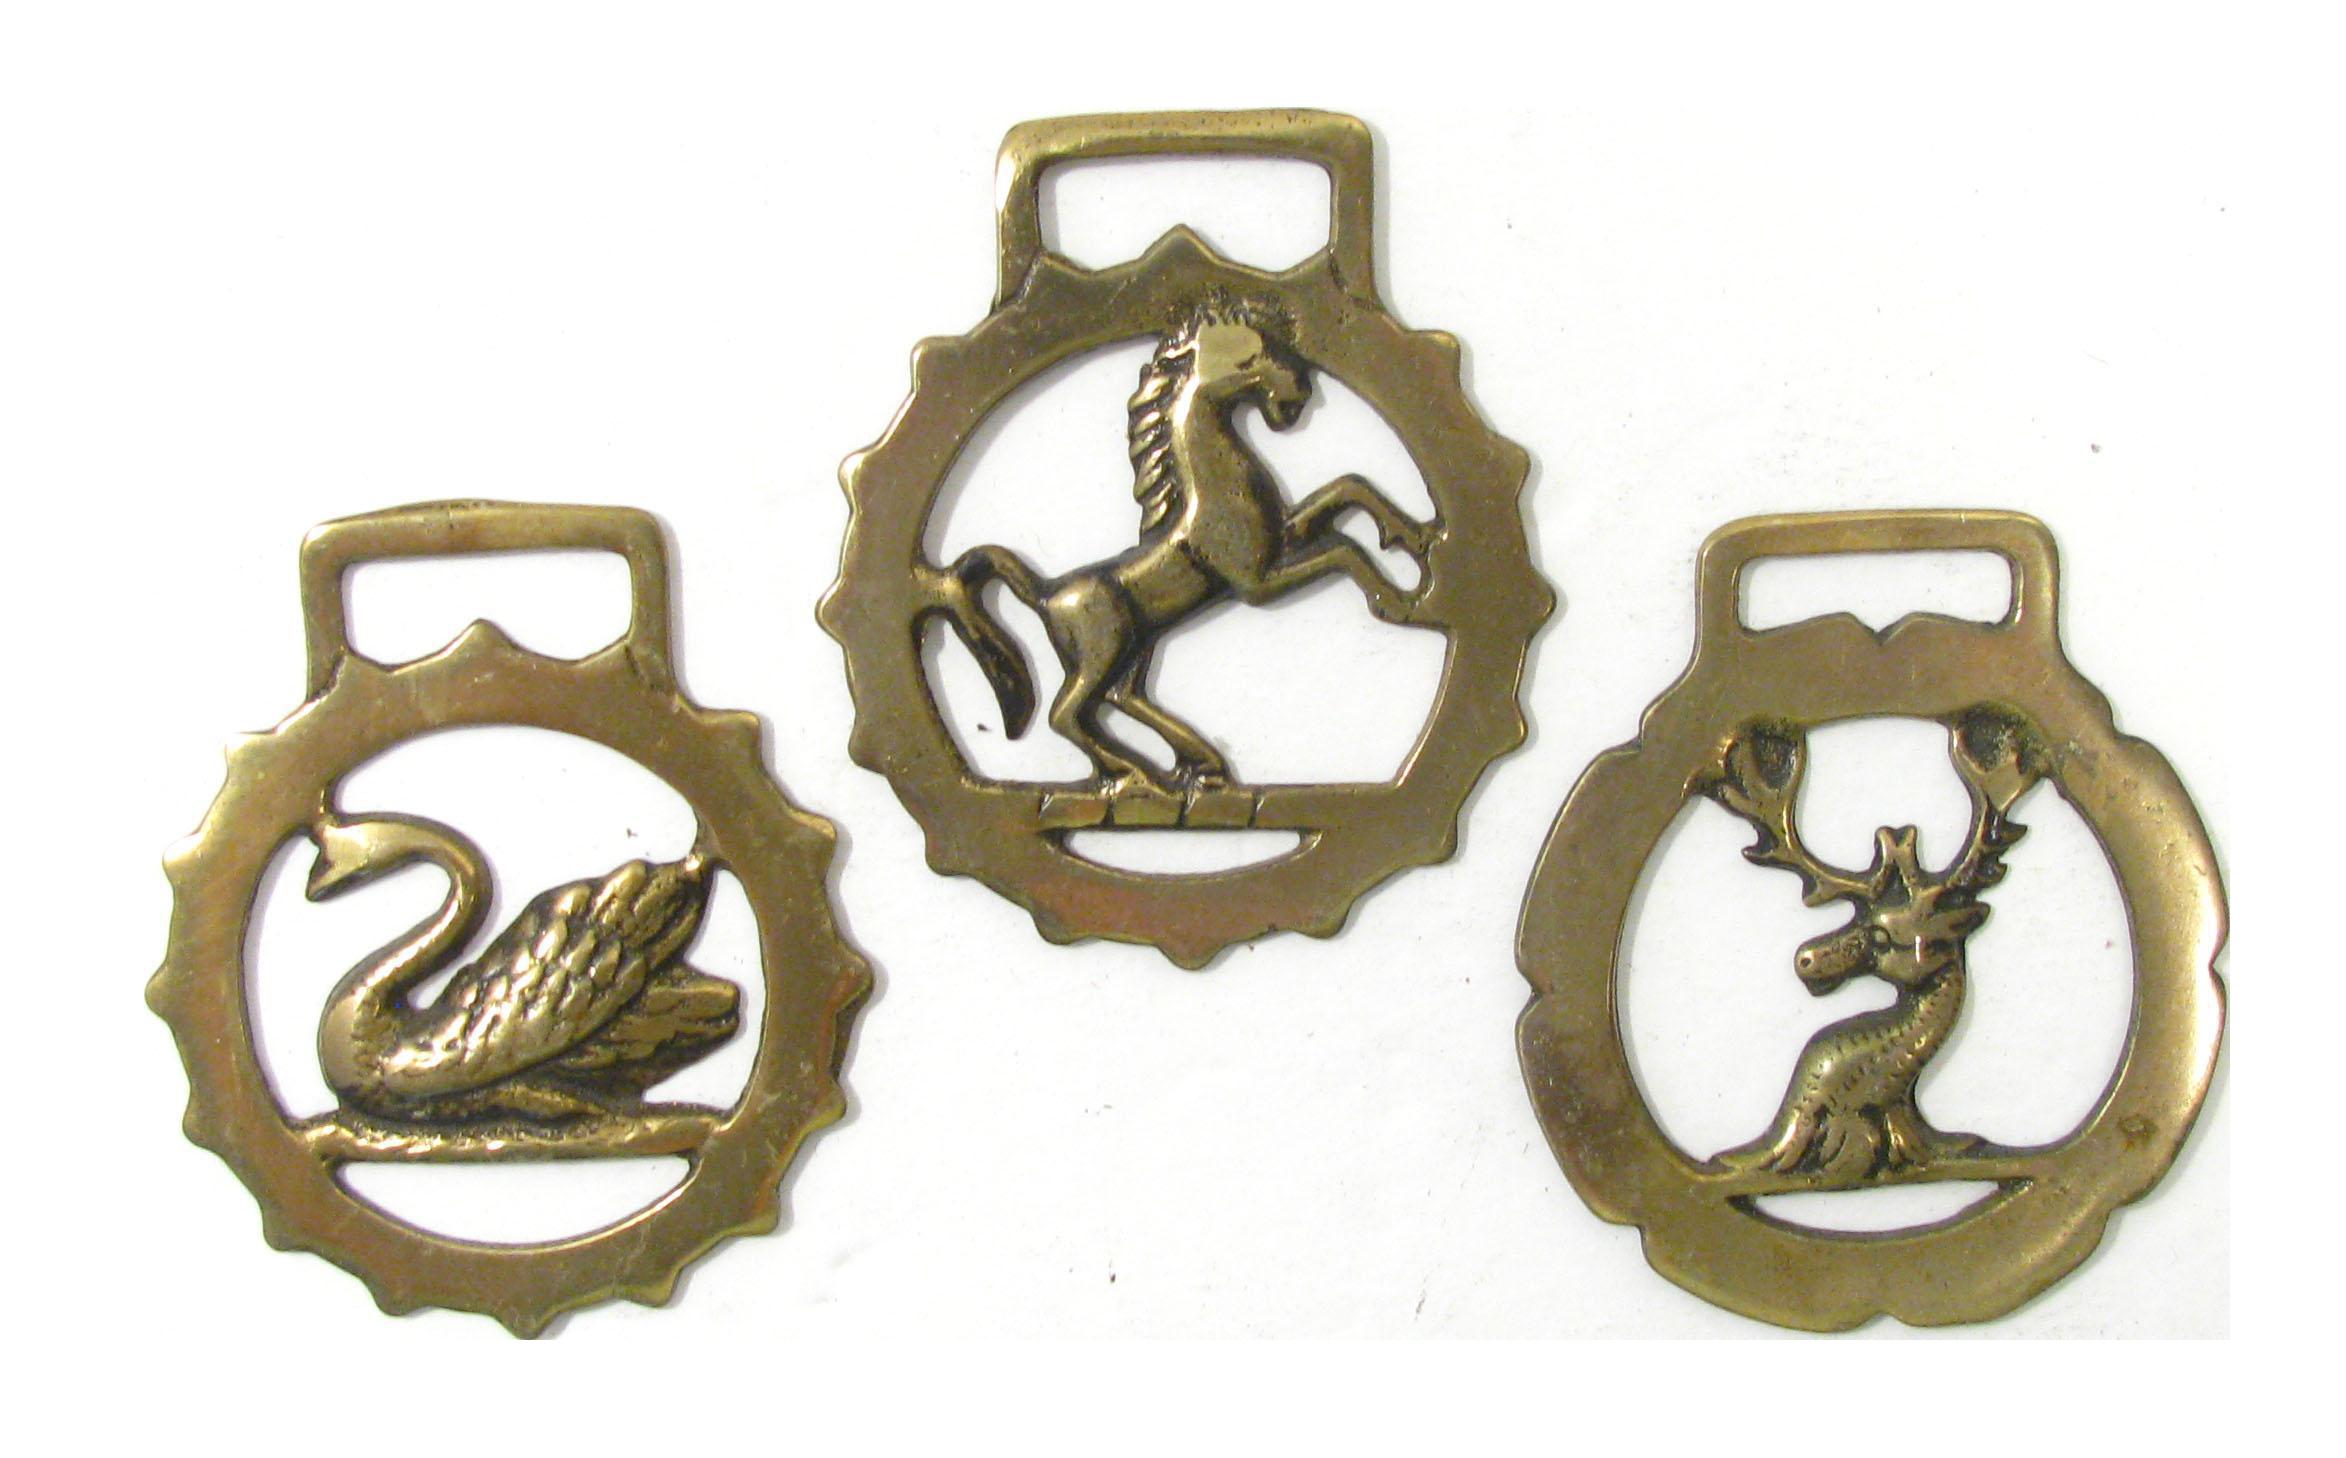 Vintage English Horse Brasses Set Of 3 Chairish